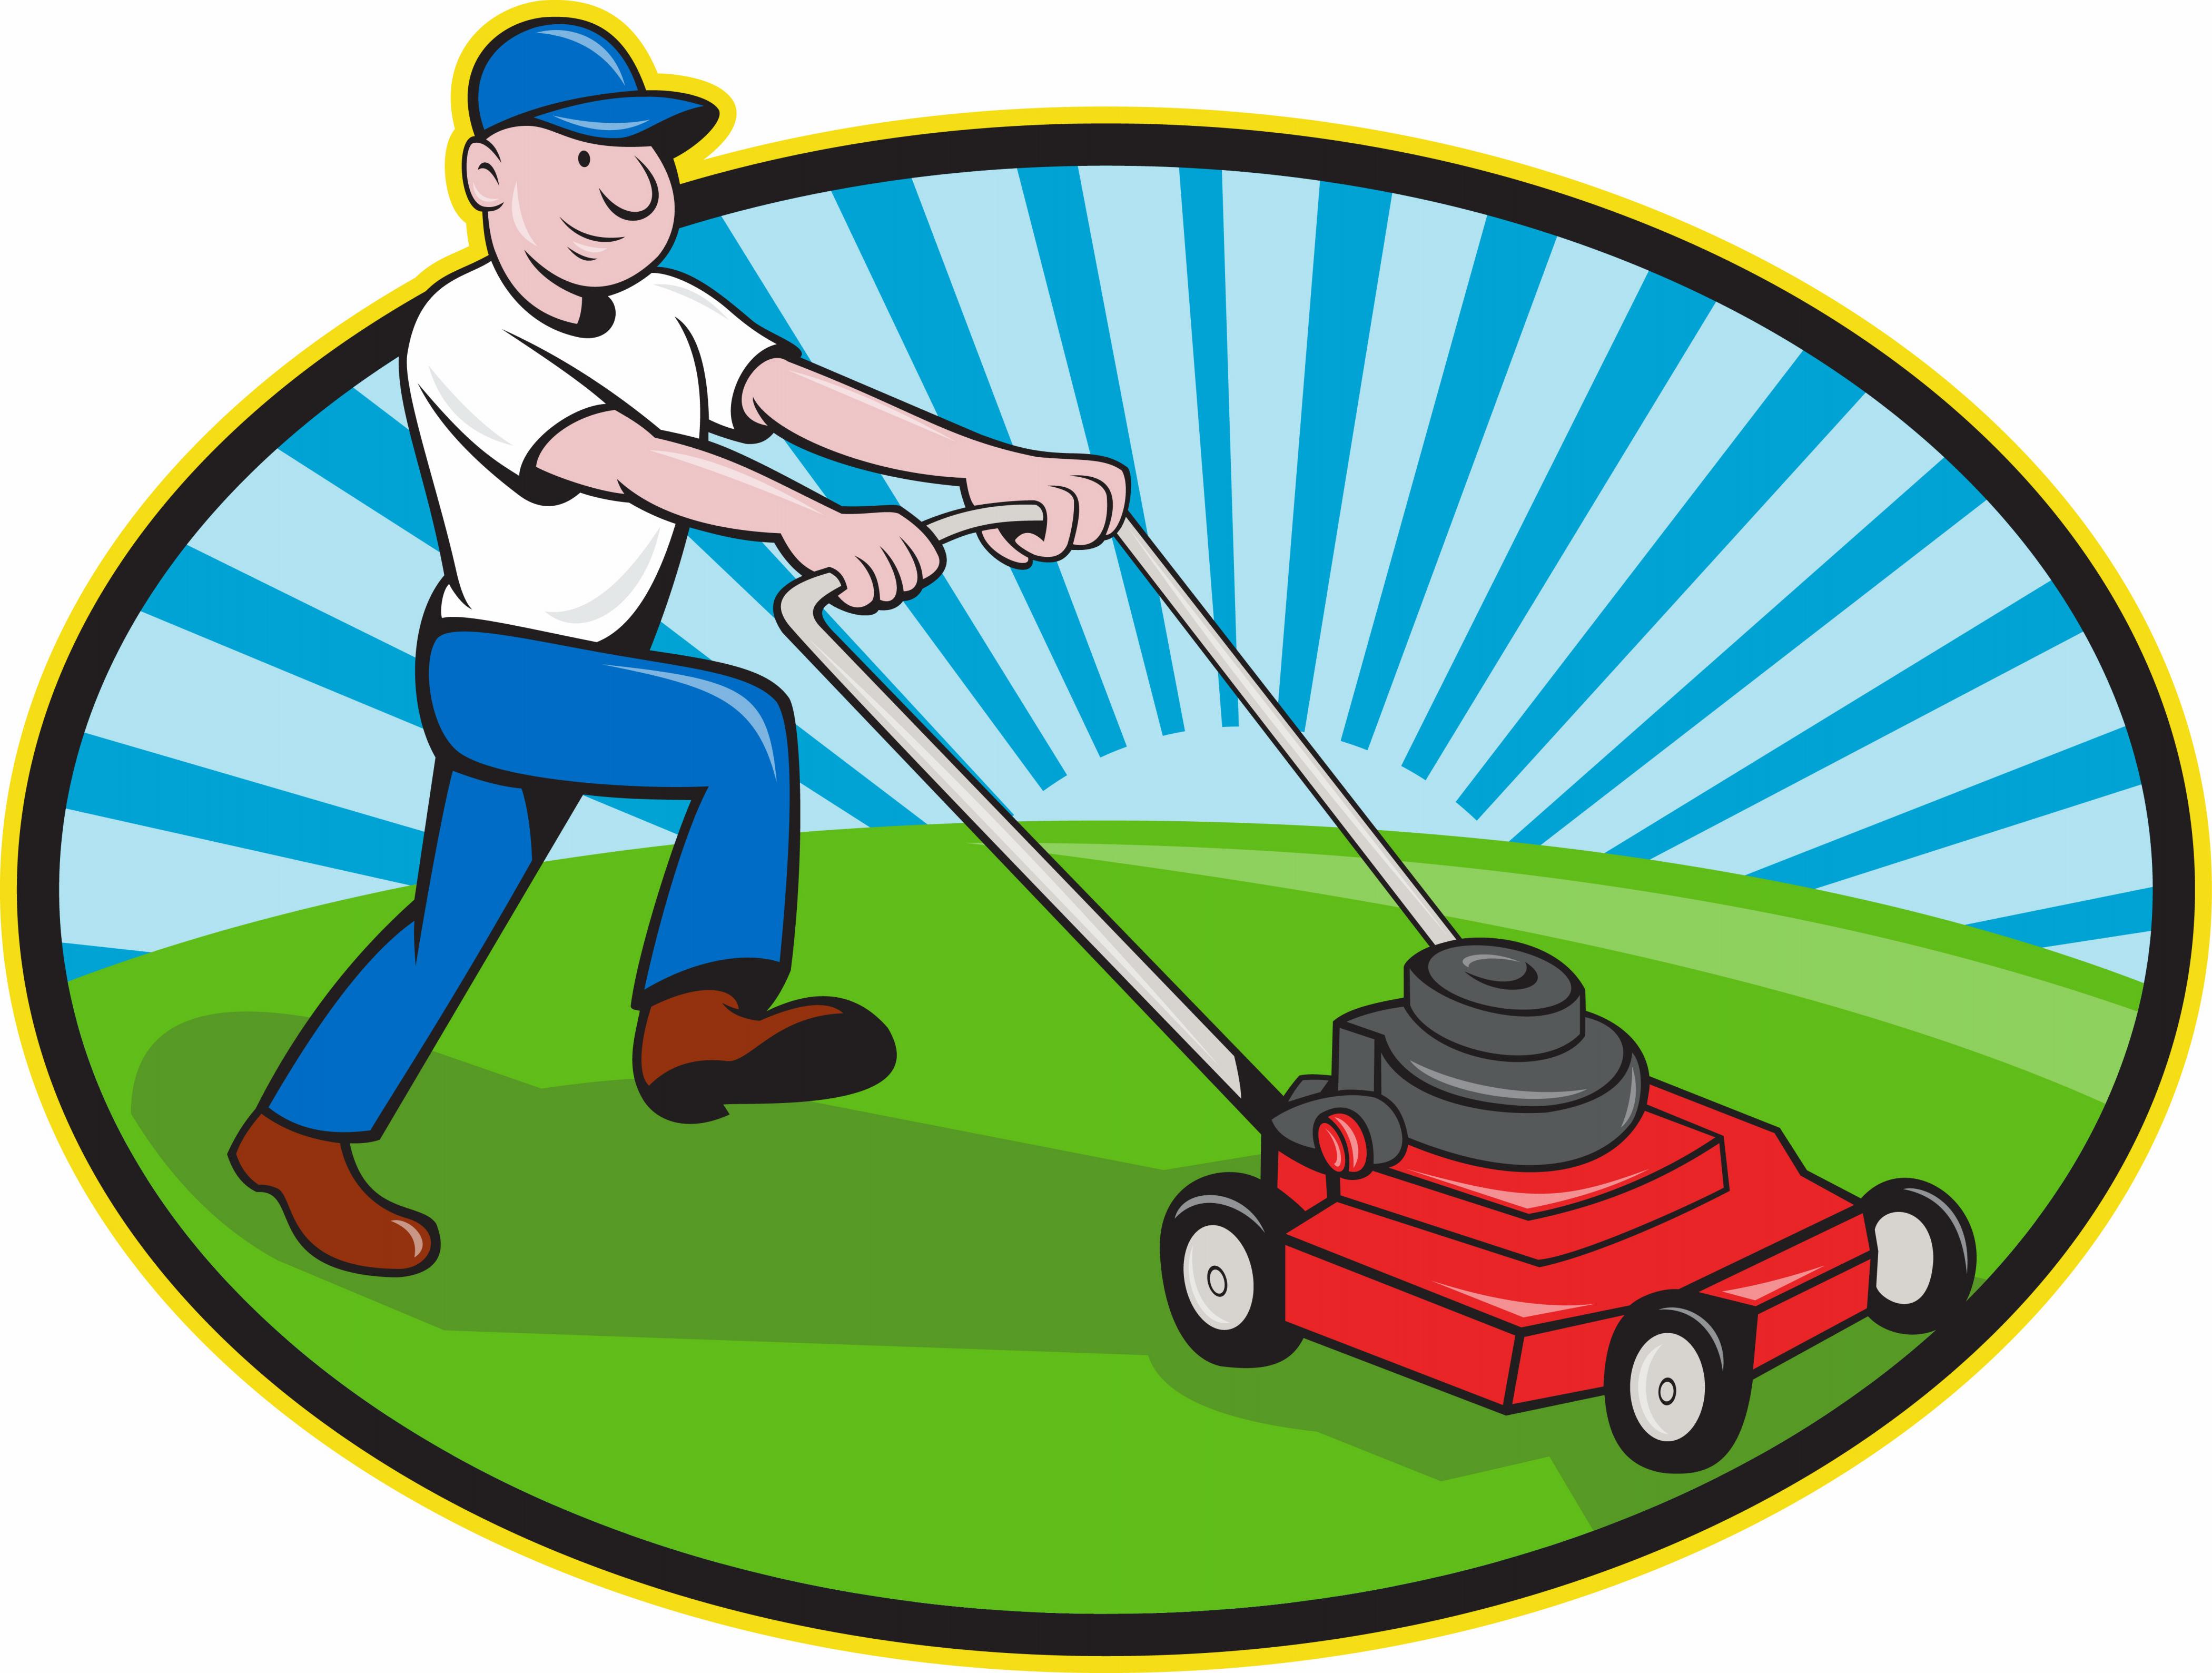 Free download best . Gardener clipart male gardener